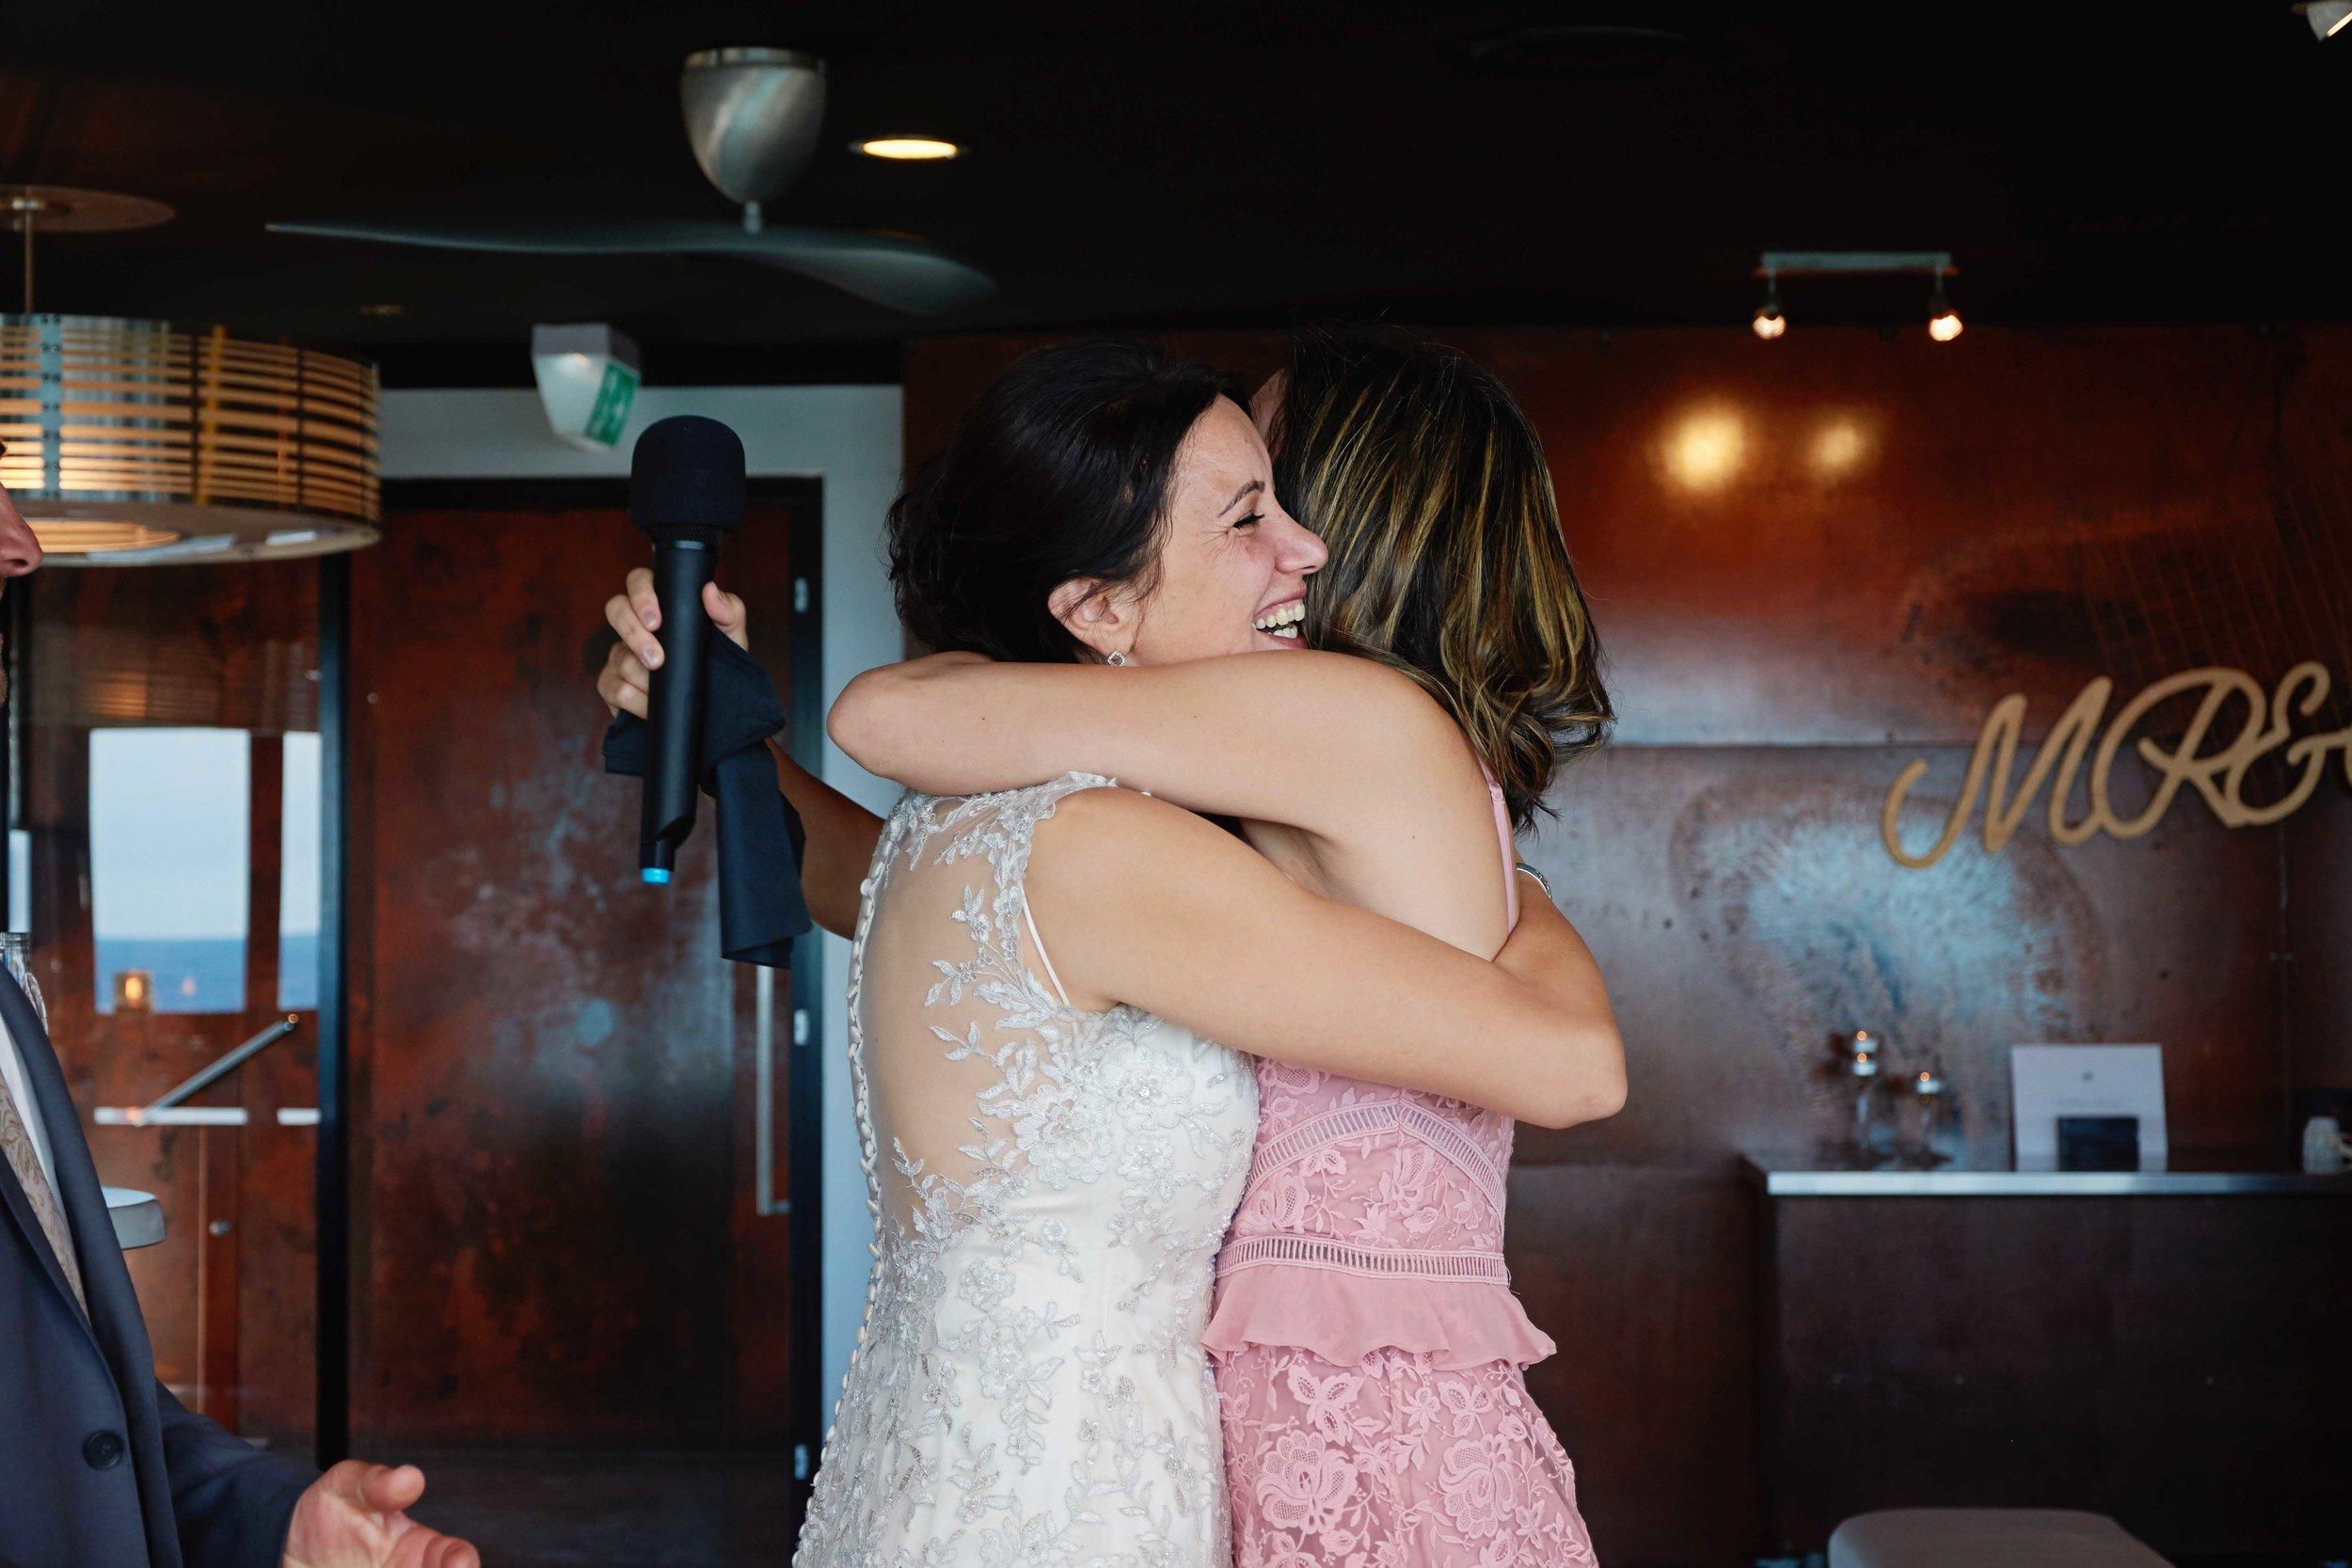 sorrento-wedding-photography-all-smiles-marissa-jade-photography-101.jpg